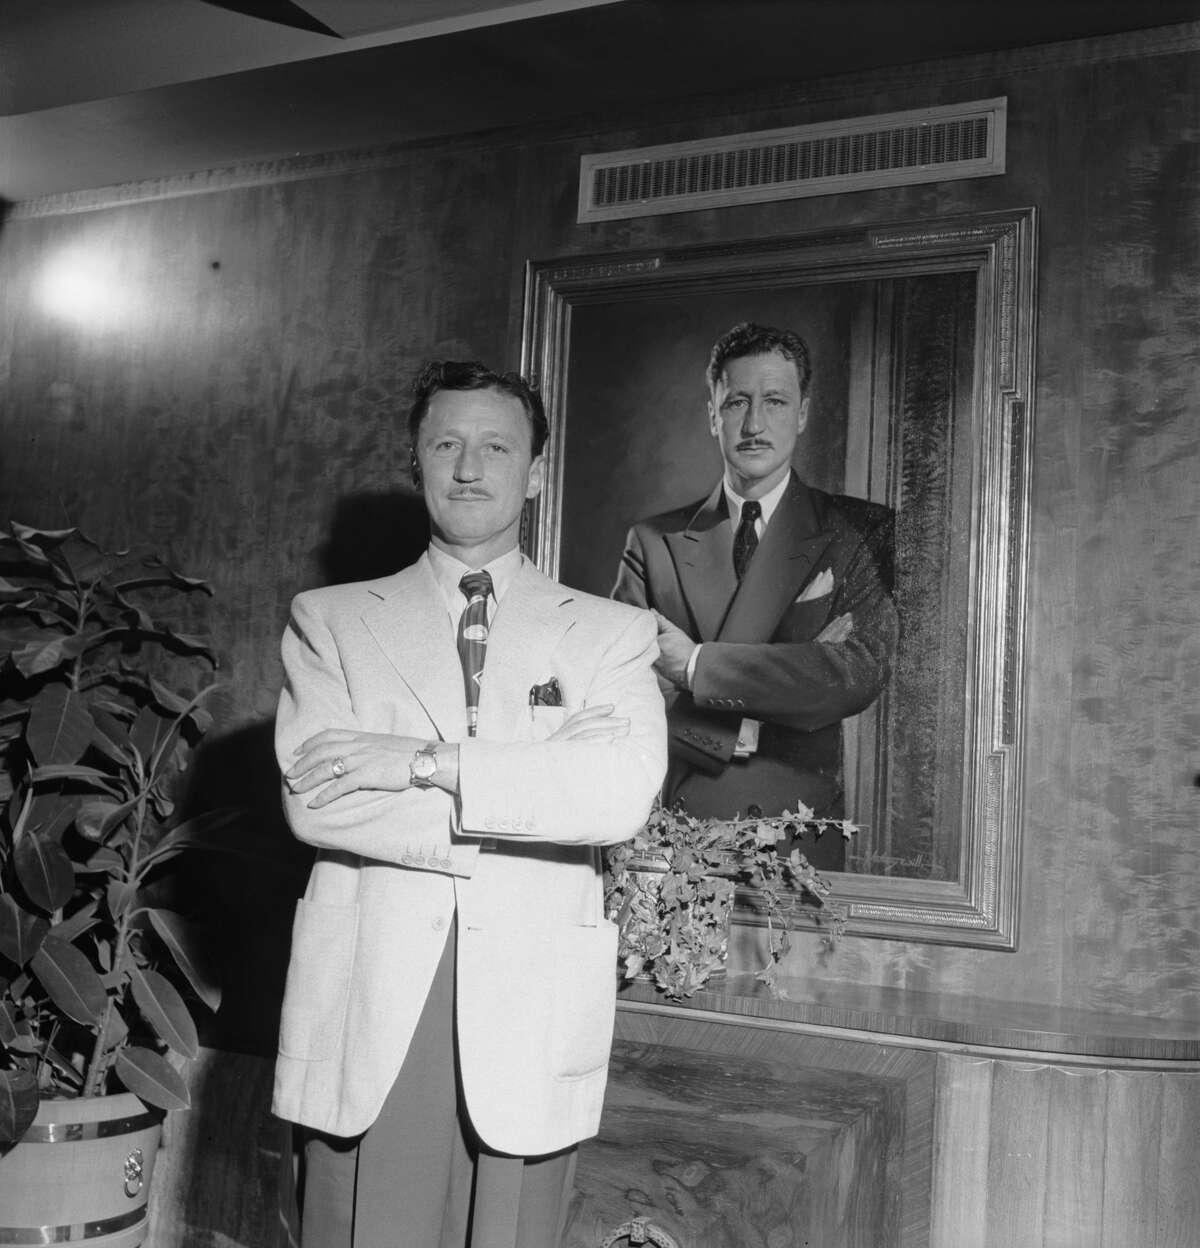 Oilman and Shamrock Hotel owner Glenn McCarthy posing at the Shamrock Hotel in Houston, Texas, March 1949.